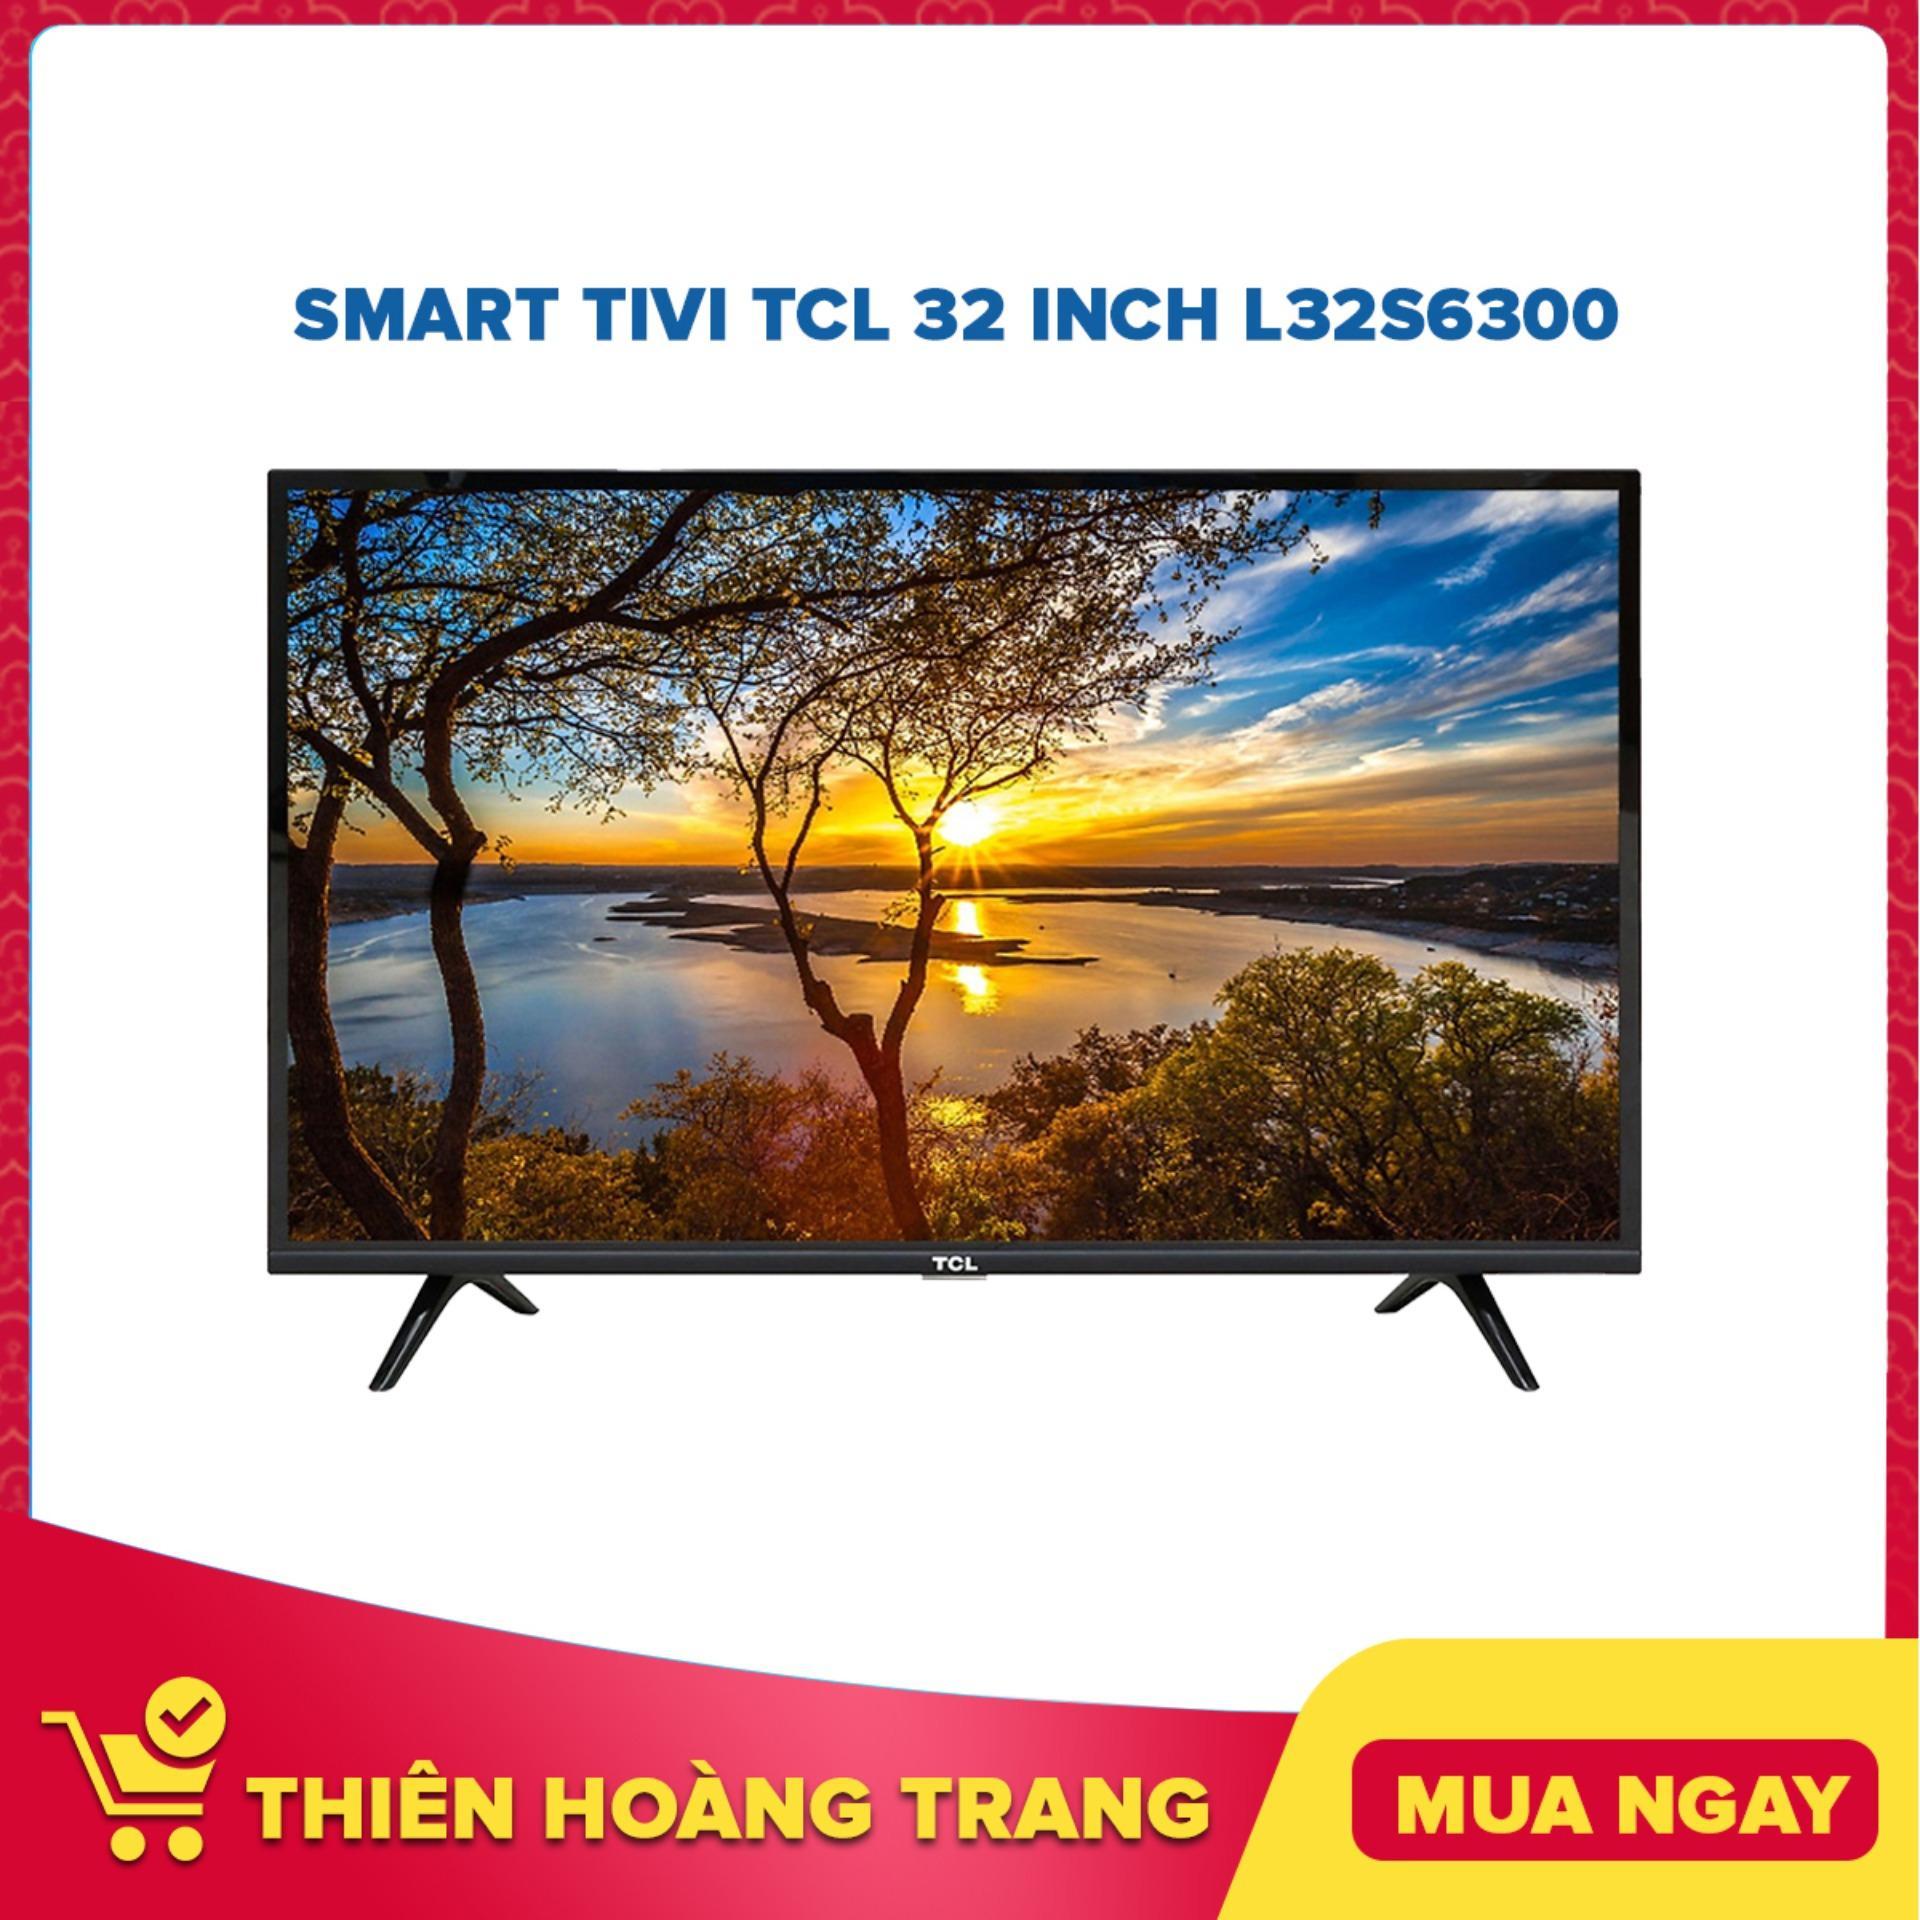 Bảng giá Smart Tivi TCL 32 inch L32S6300